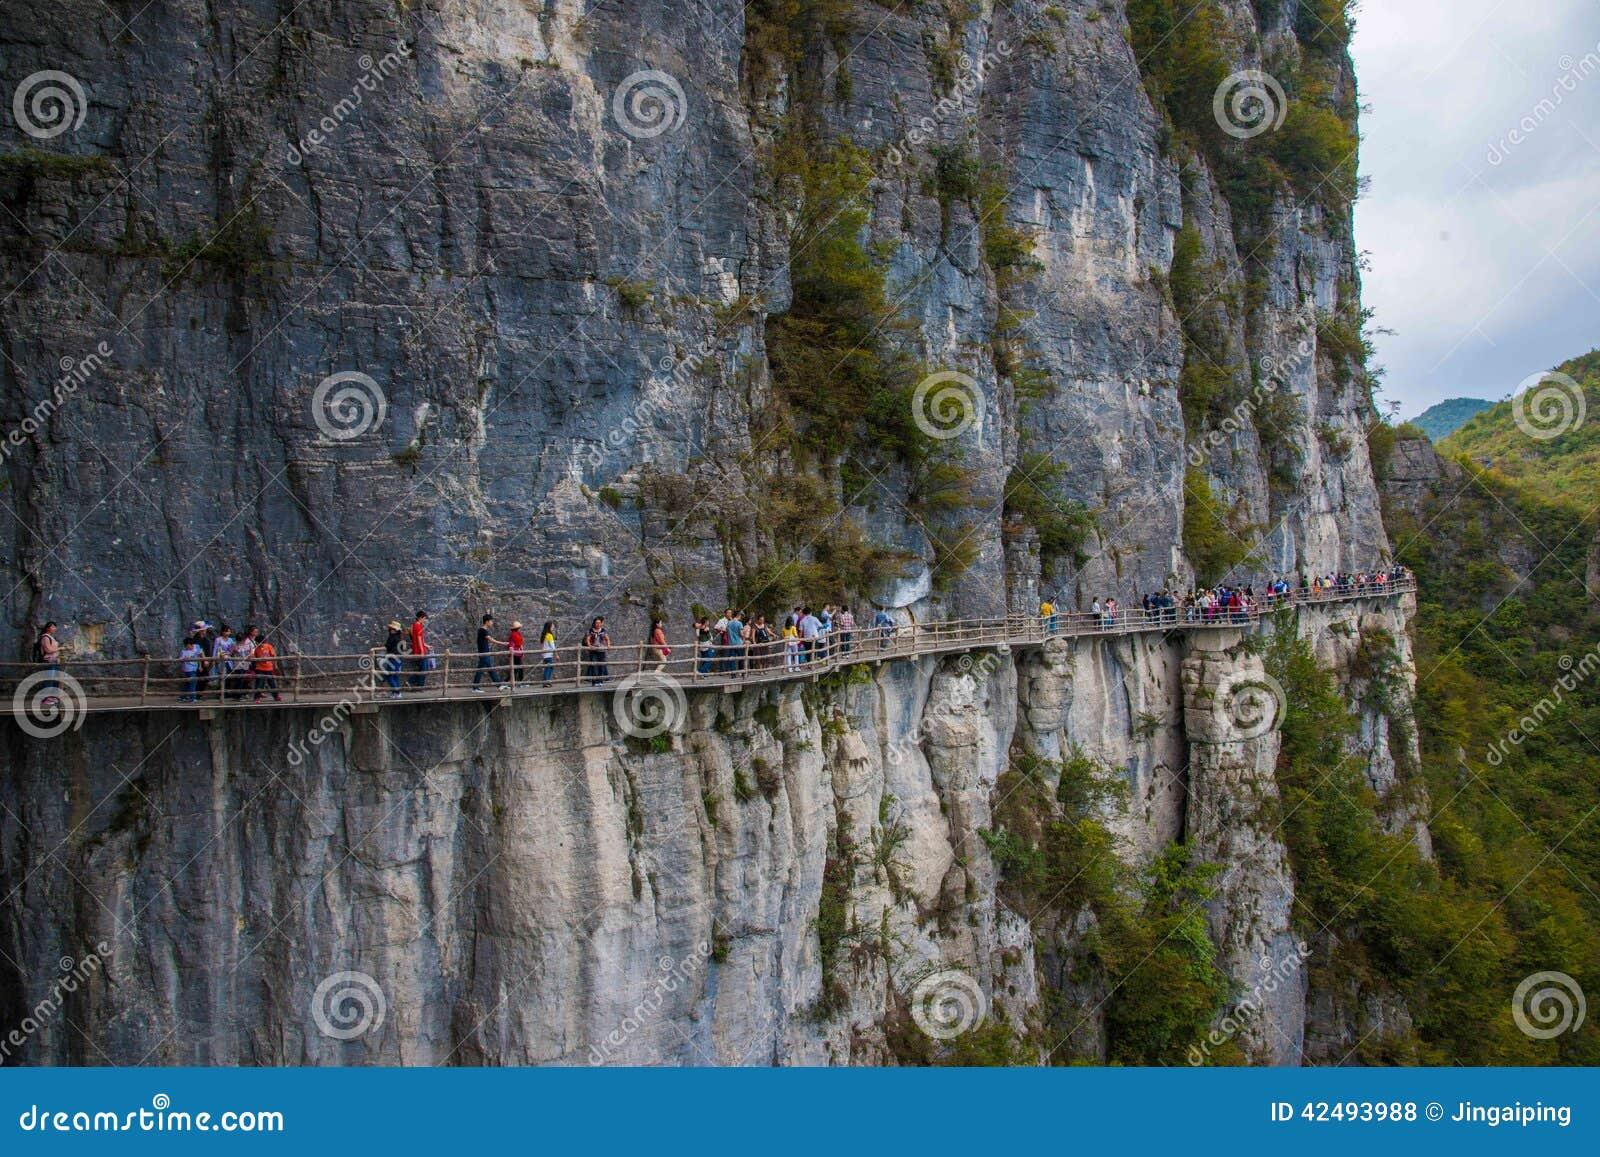 enshi women Mufu grand canyon: amazing site - see 67 traveler reviews, 121 candid photos, and great deals for enshi, china, at tripadvisor.